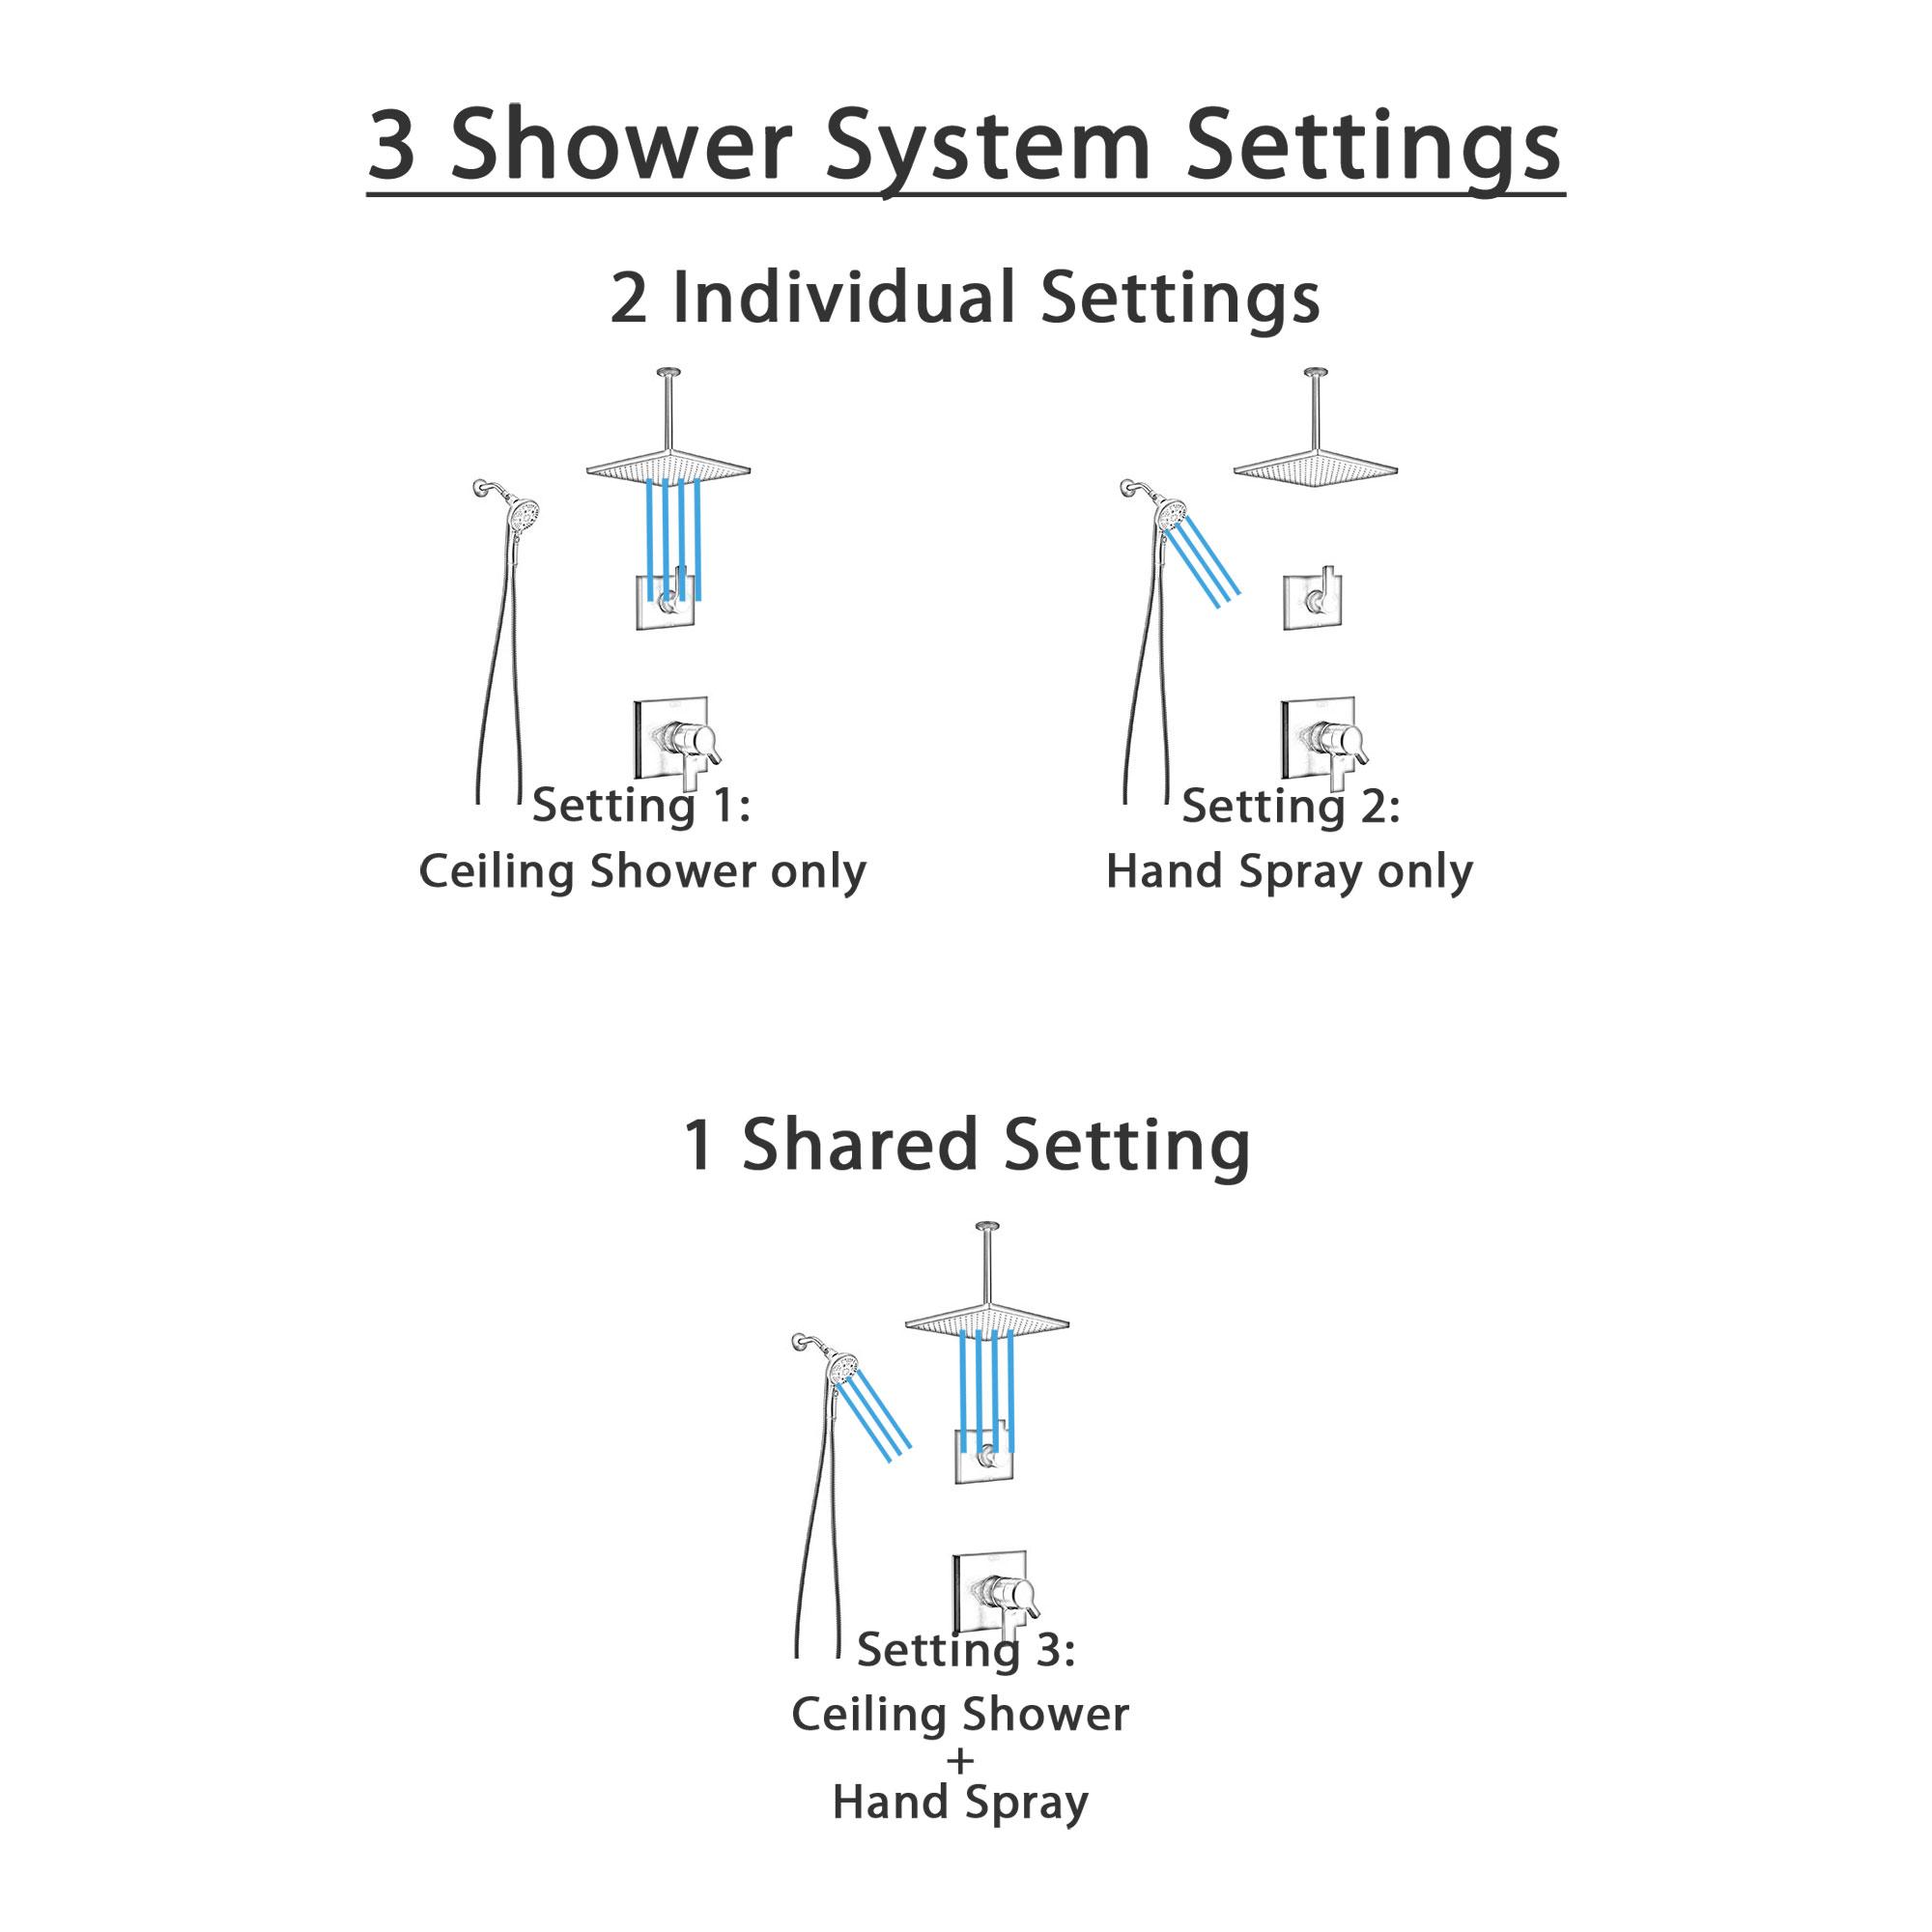 Delta Pivotal Matte Black Finish Modern Shower System with Large Ceiling Mount Showerhead, Diverter, and SureDock Hand Shower Fixture SS17993BL8